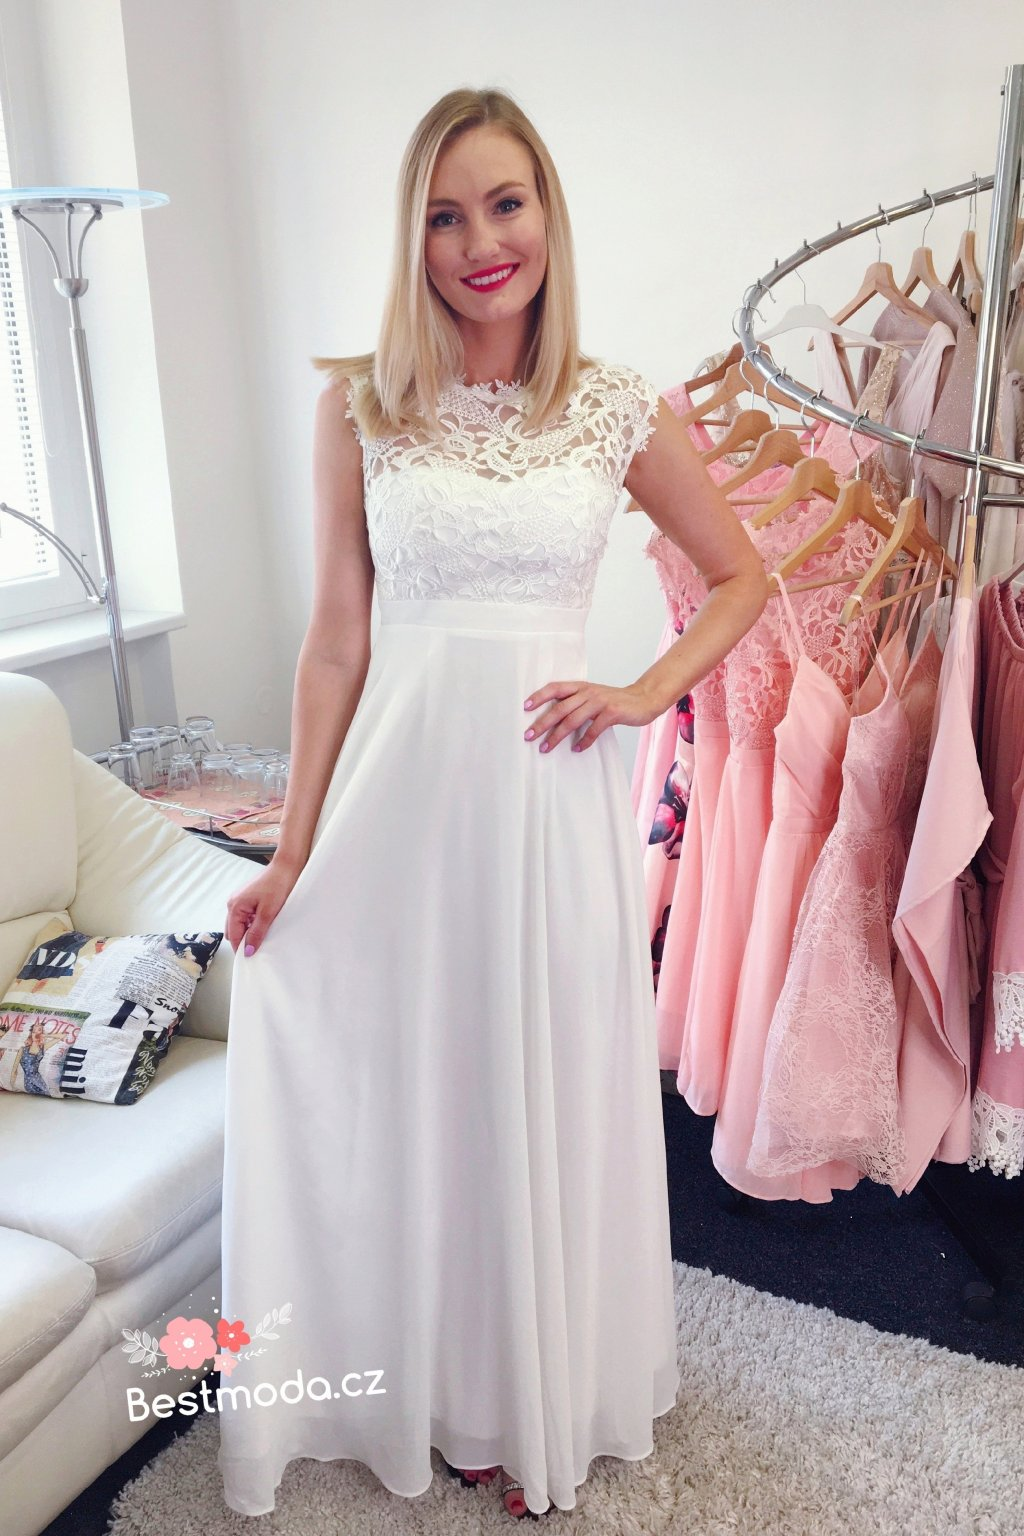 Bílé společenské šaty Eva Lola s krajkou. Neohodnoceno. 9CA781B8 412F 421A  B447 149EECDE7BF0 461d0ed52c